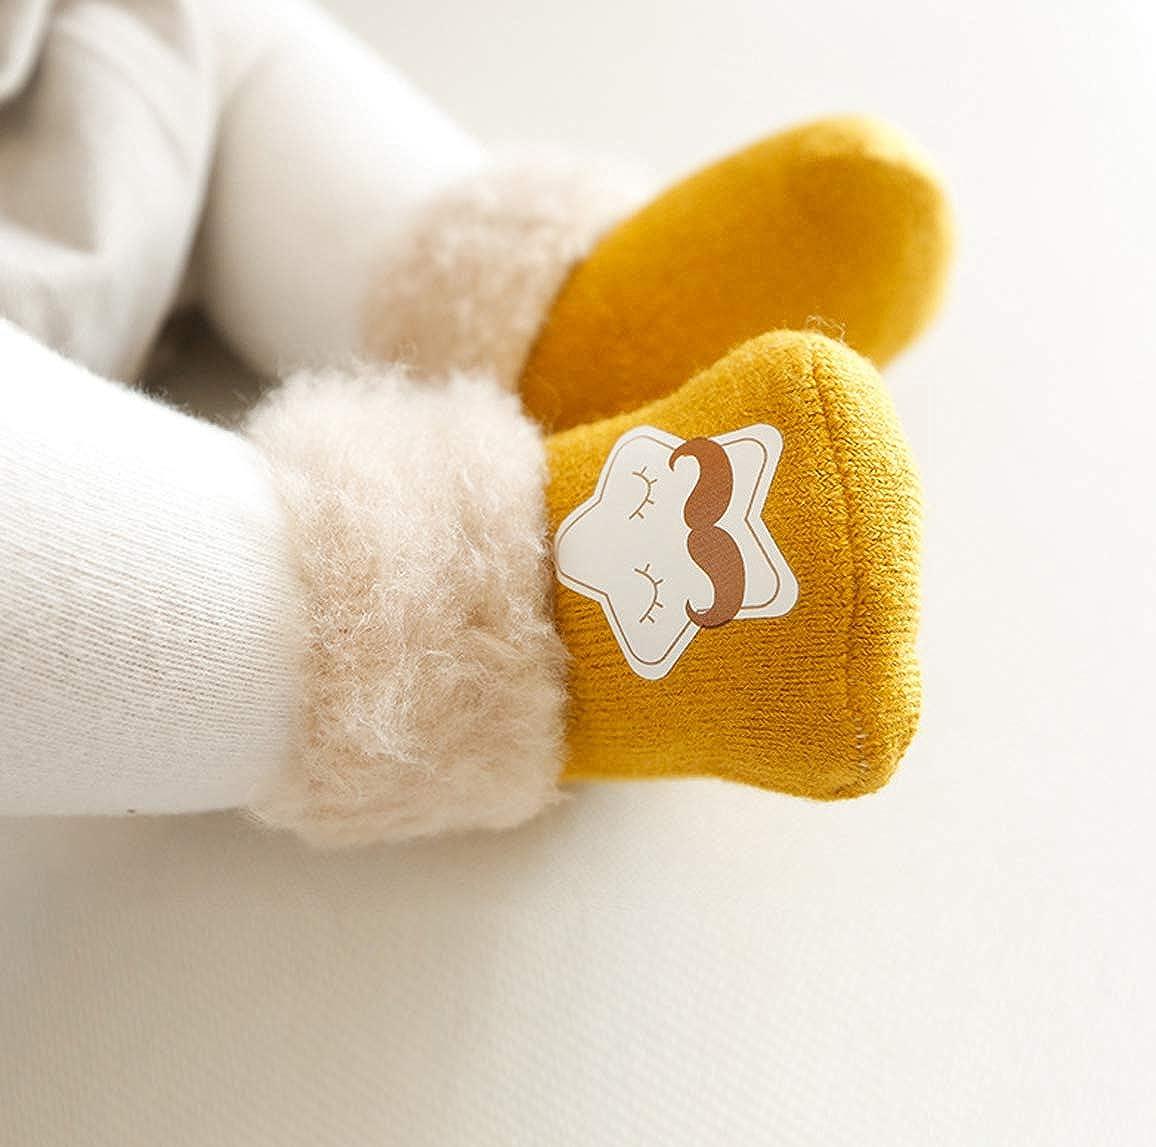 3 Pack Baby Socks Infant Ankle Socks Newborn Cute Cartoon Thick Socks